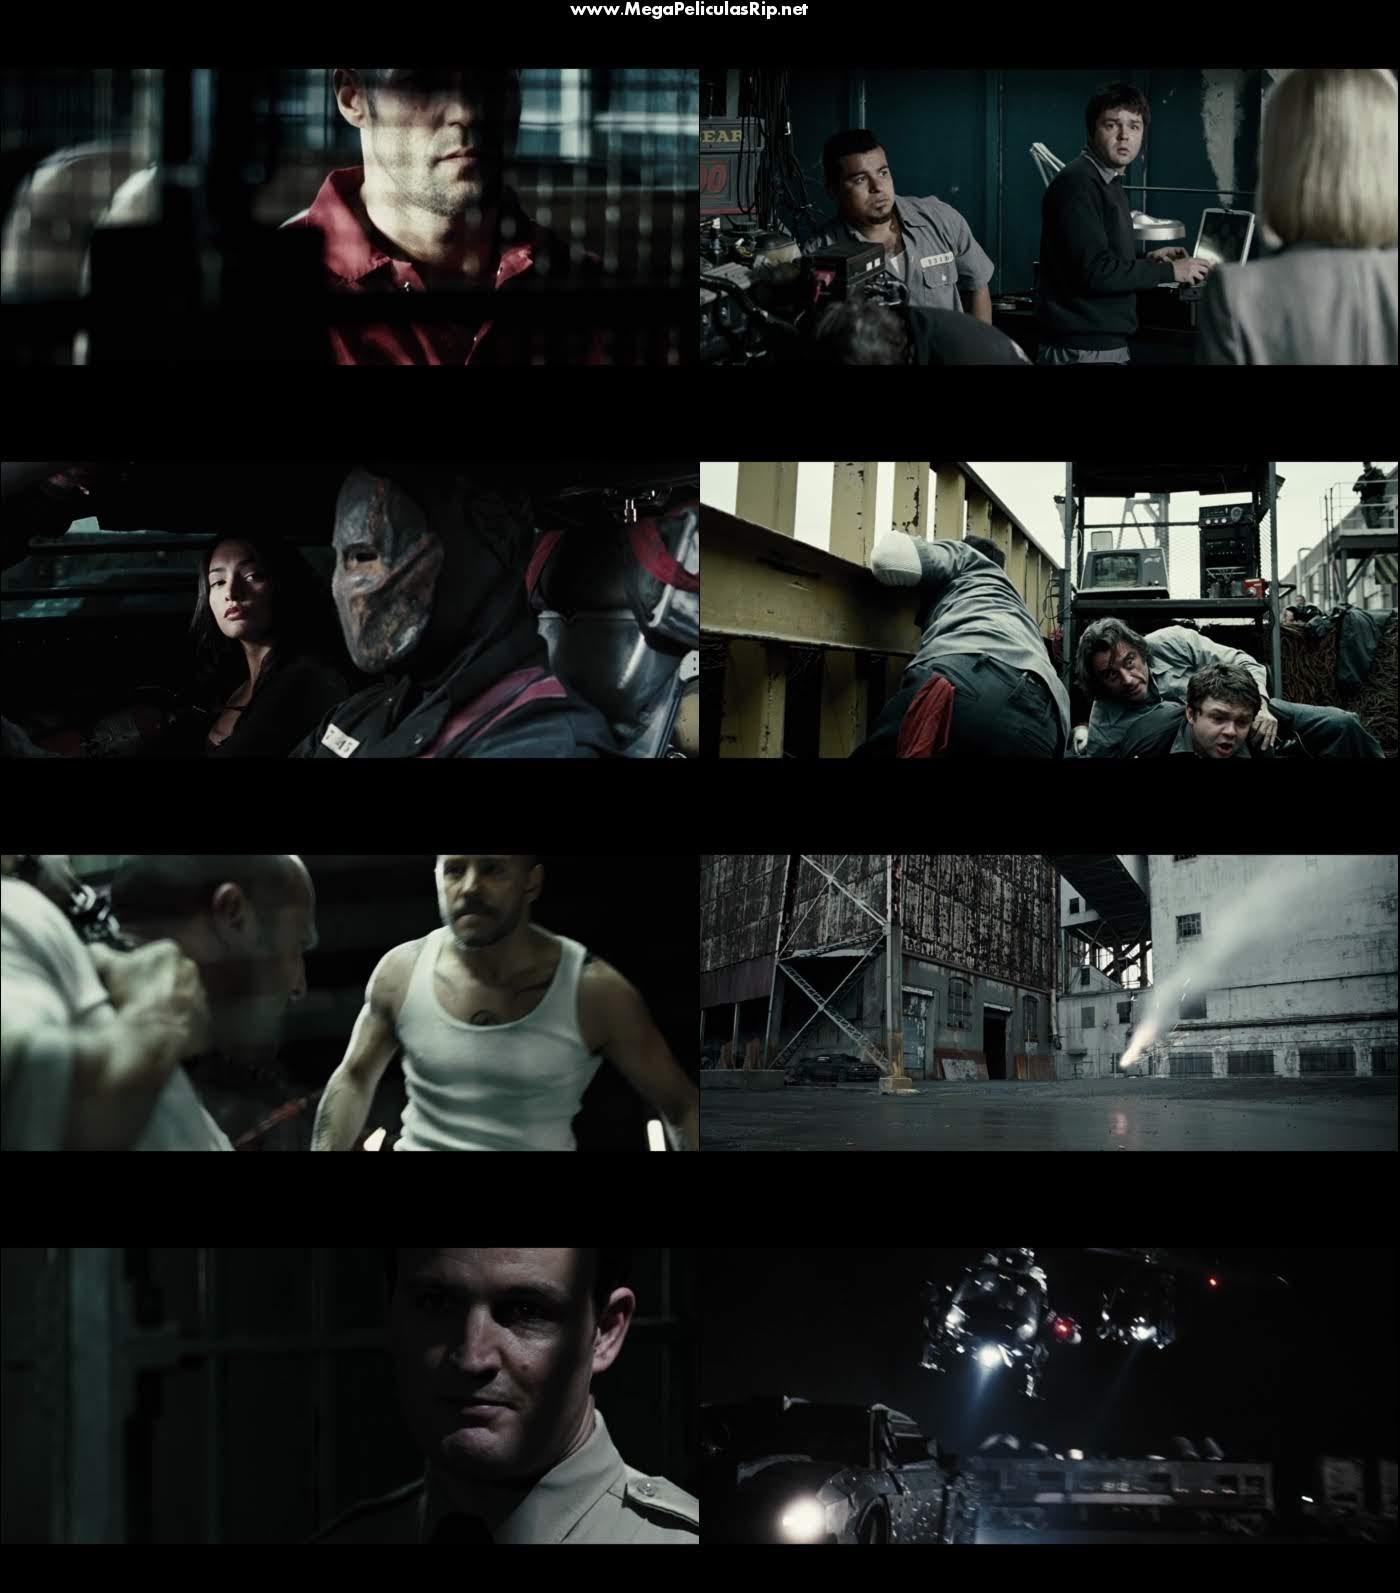 La Carrera De La Muerte 1080p Latino